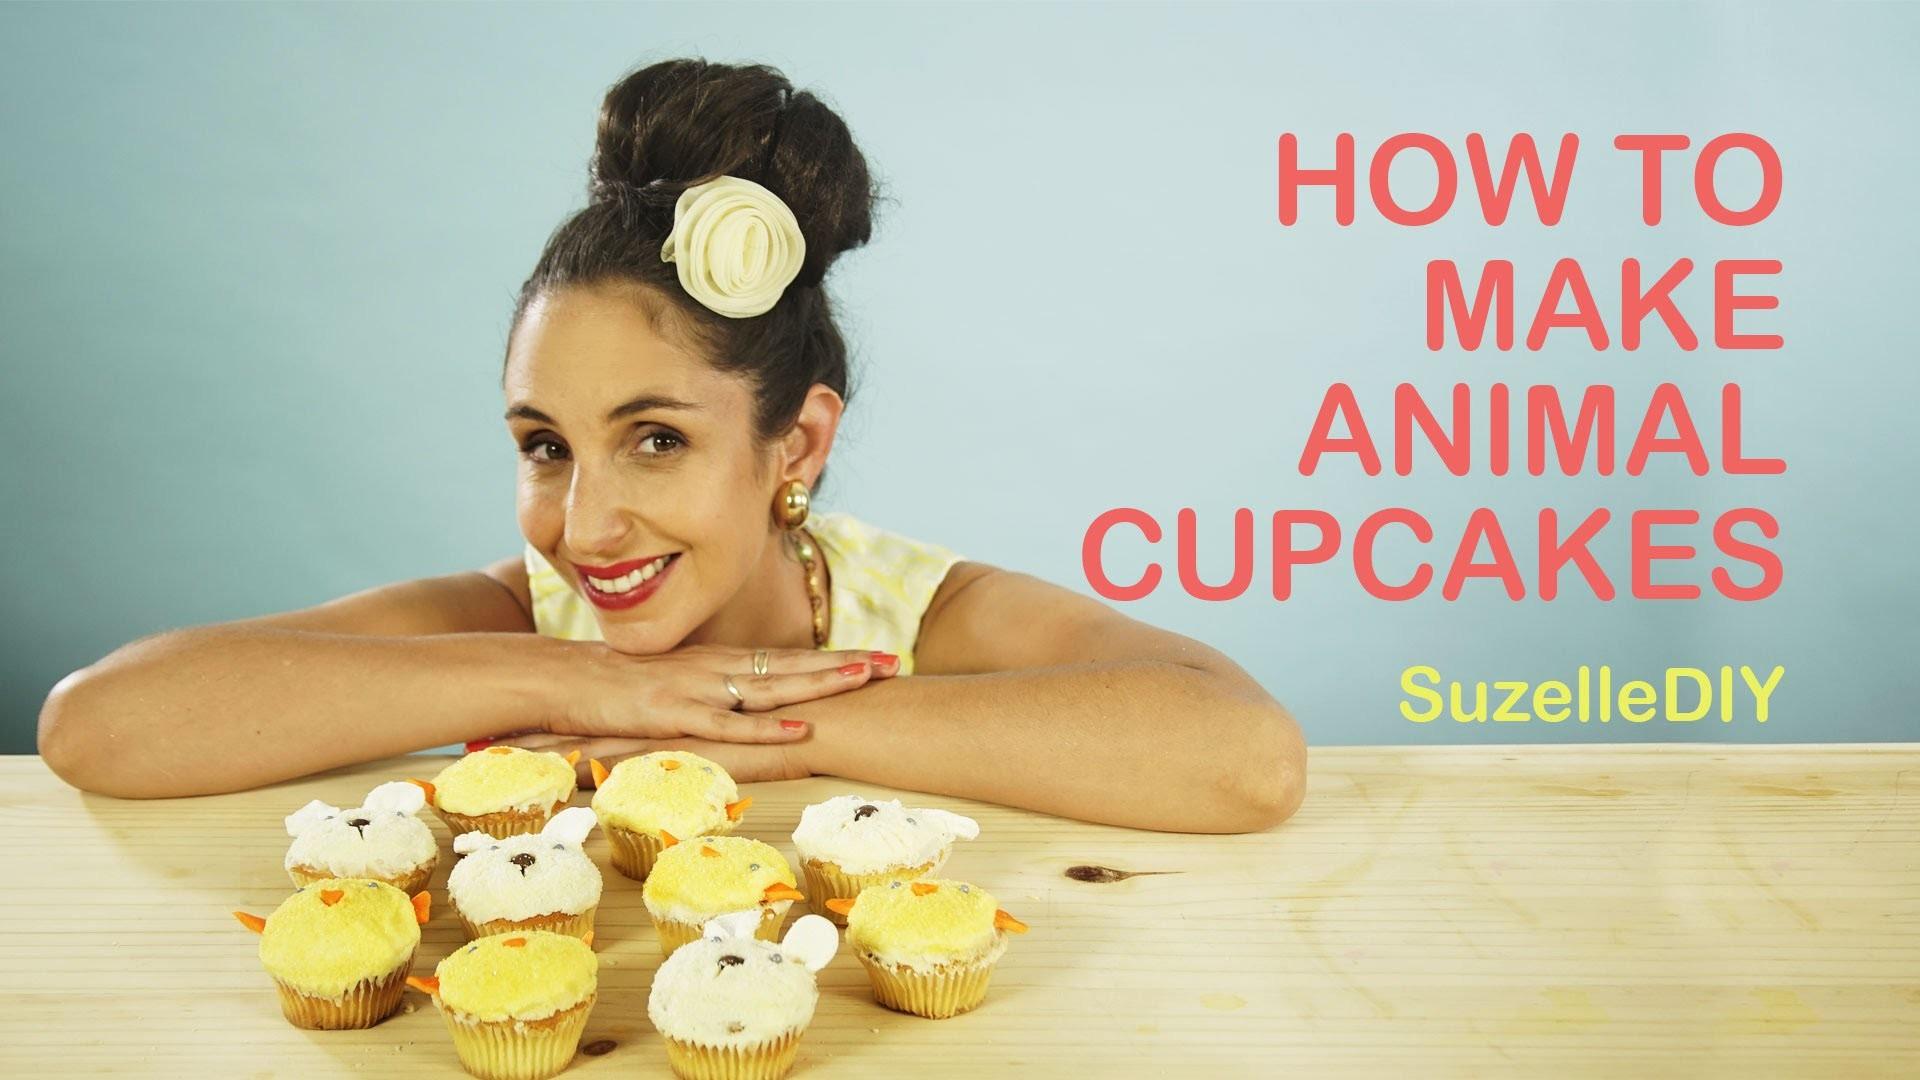 SuzelleDIY - How to Make Animal Cupcakes